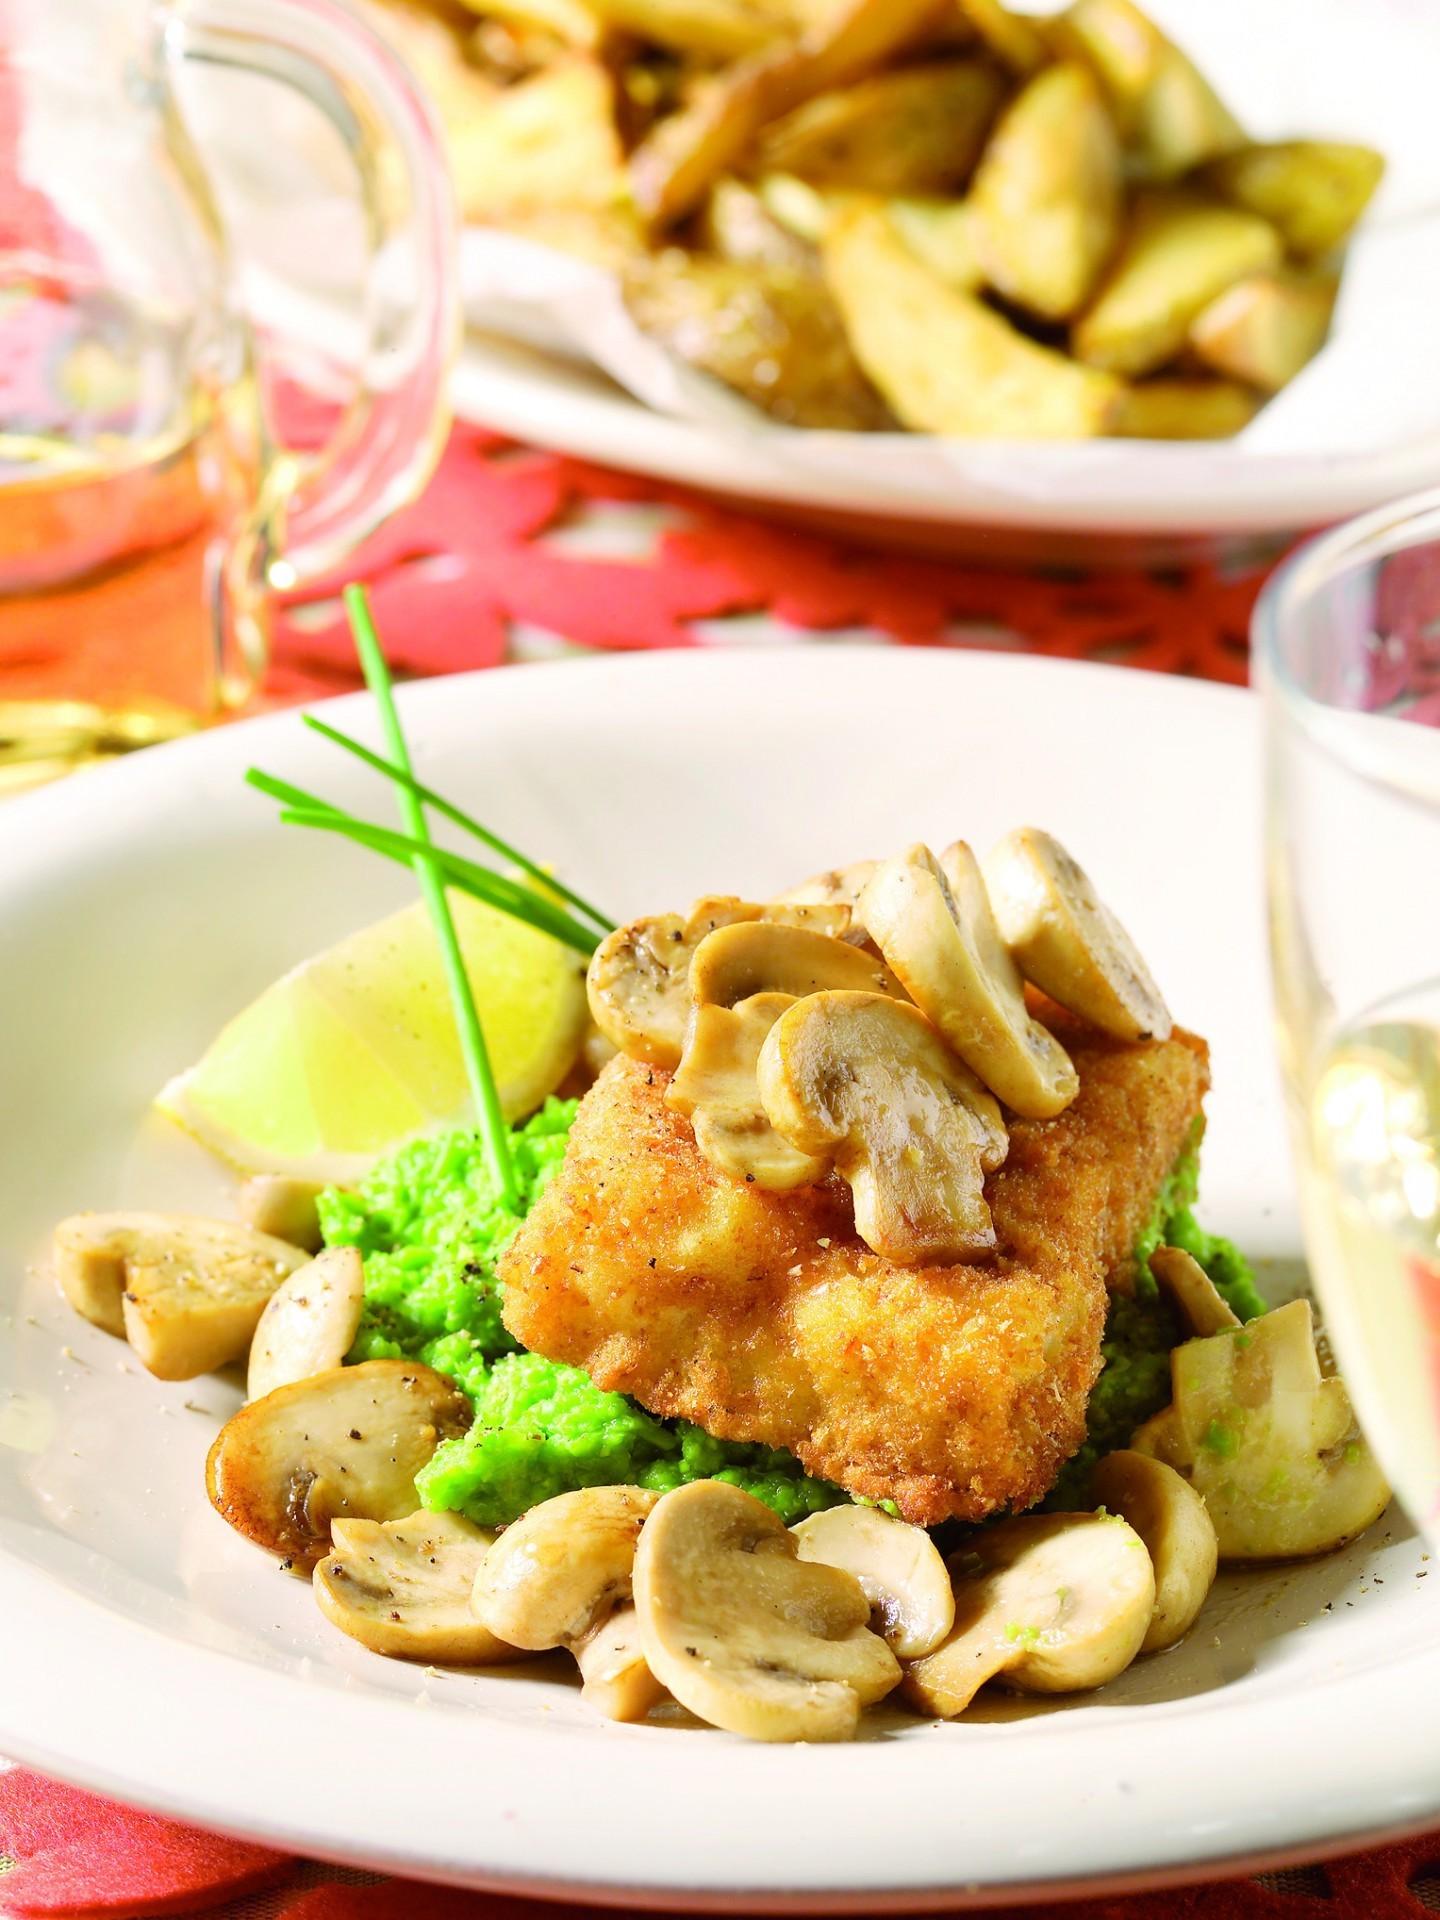 Fried fish with pea puree